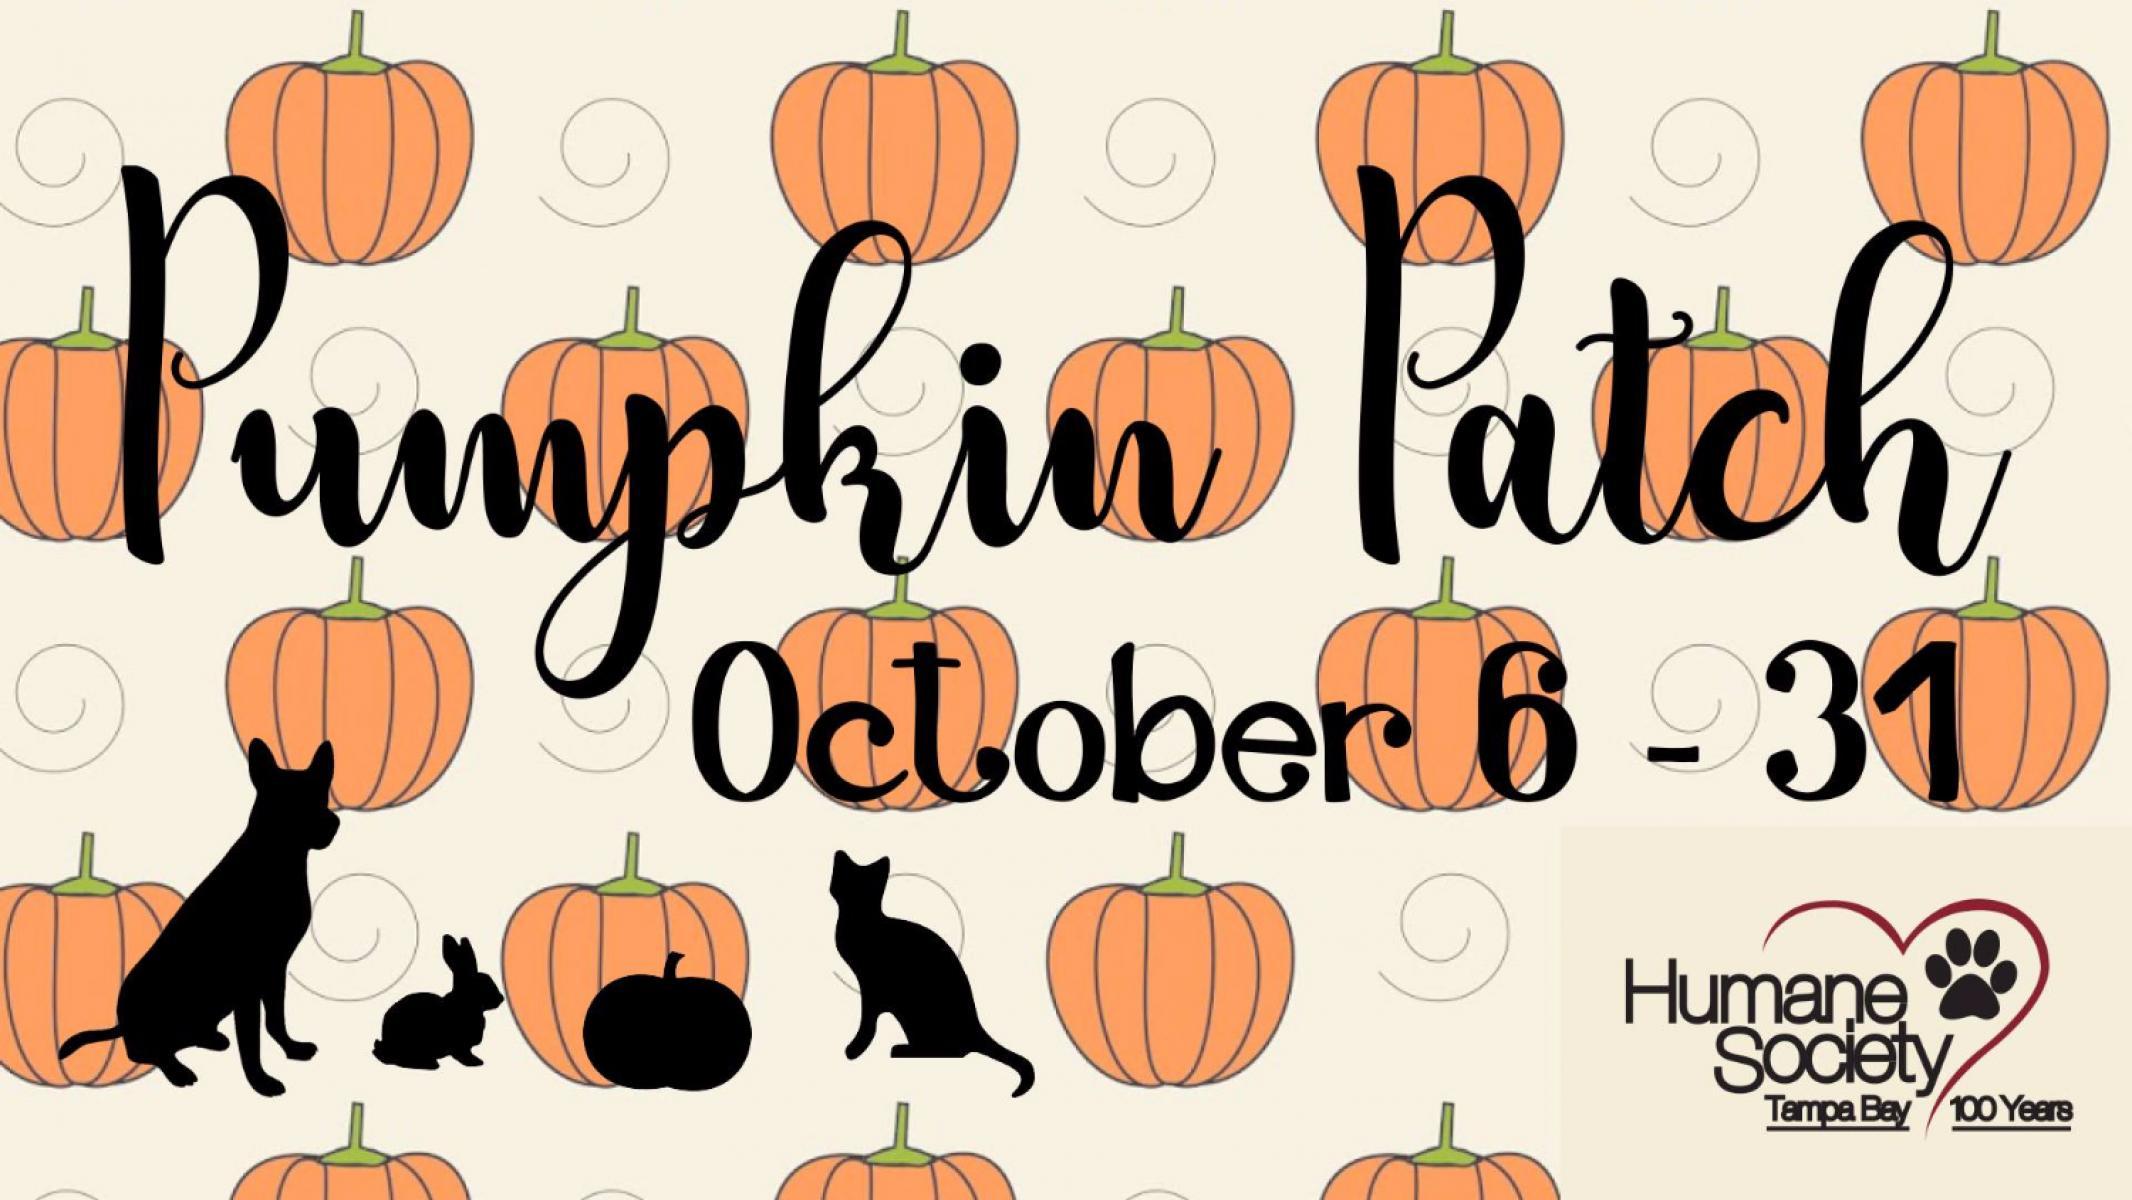 15th Annual Humane Society Pumpkin Patch